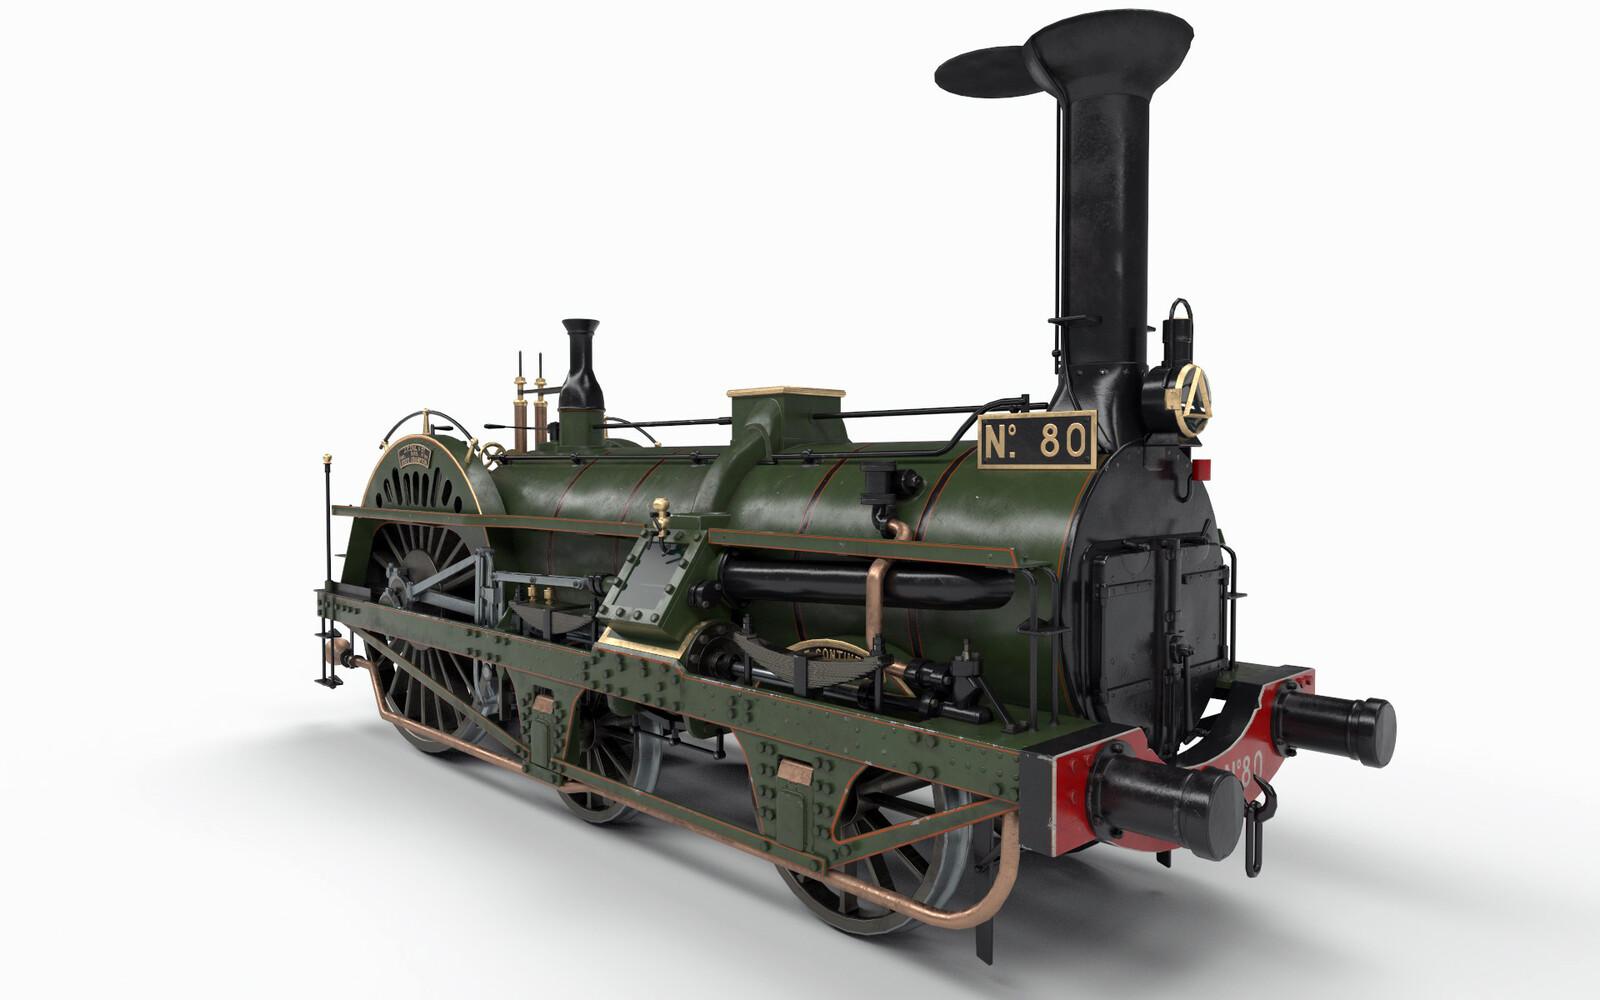 Le Continent (historical train)